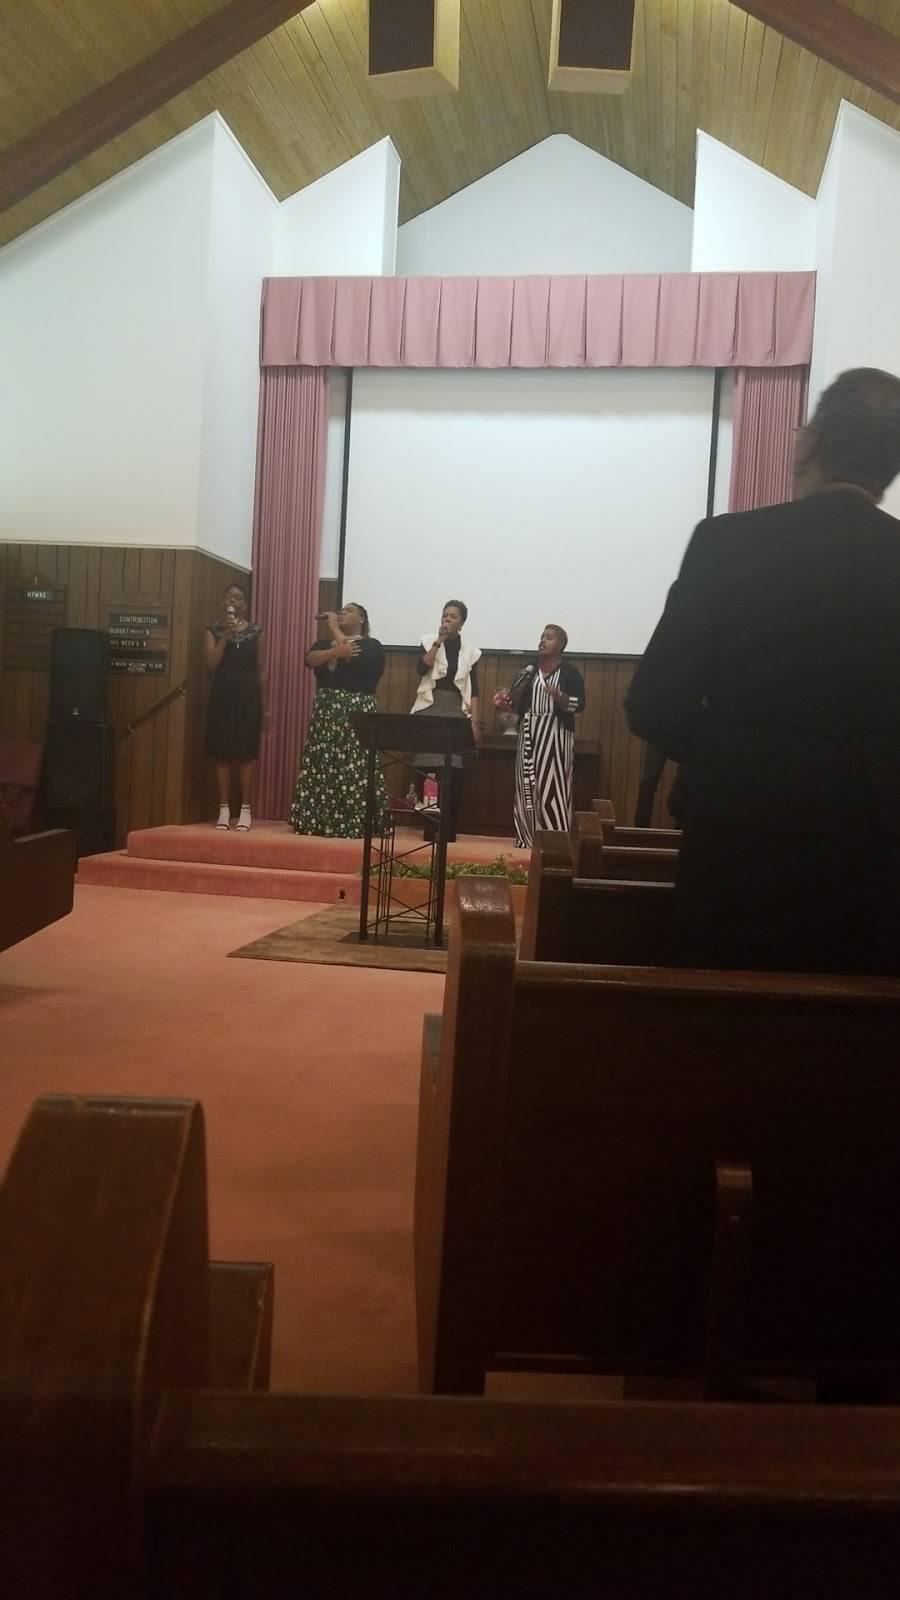 Sun Valley Church of Christ - church    Photo 2 of 2   Address: 604 23rd Ave NW, Birmingham, AL 35215, USA   Phone: (205) 853-3904